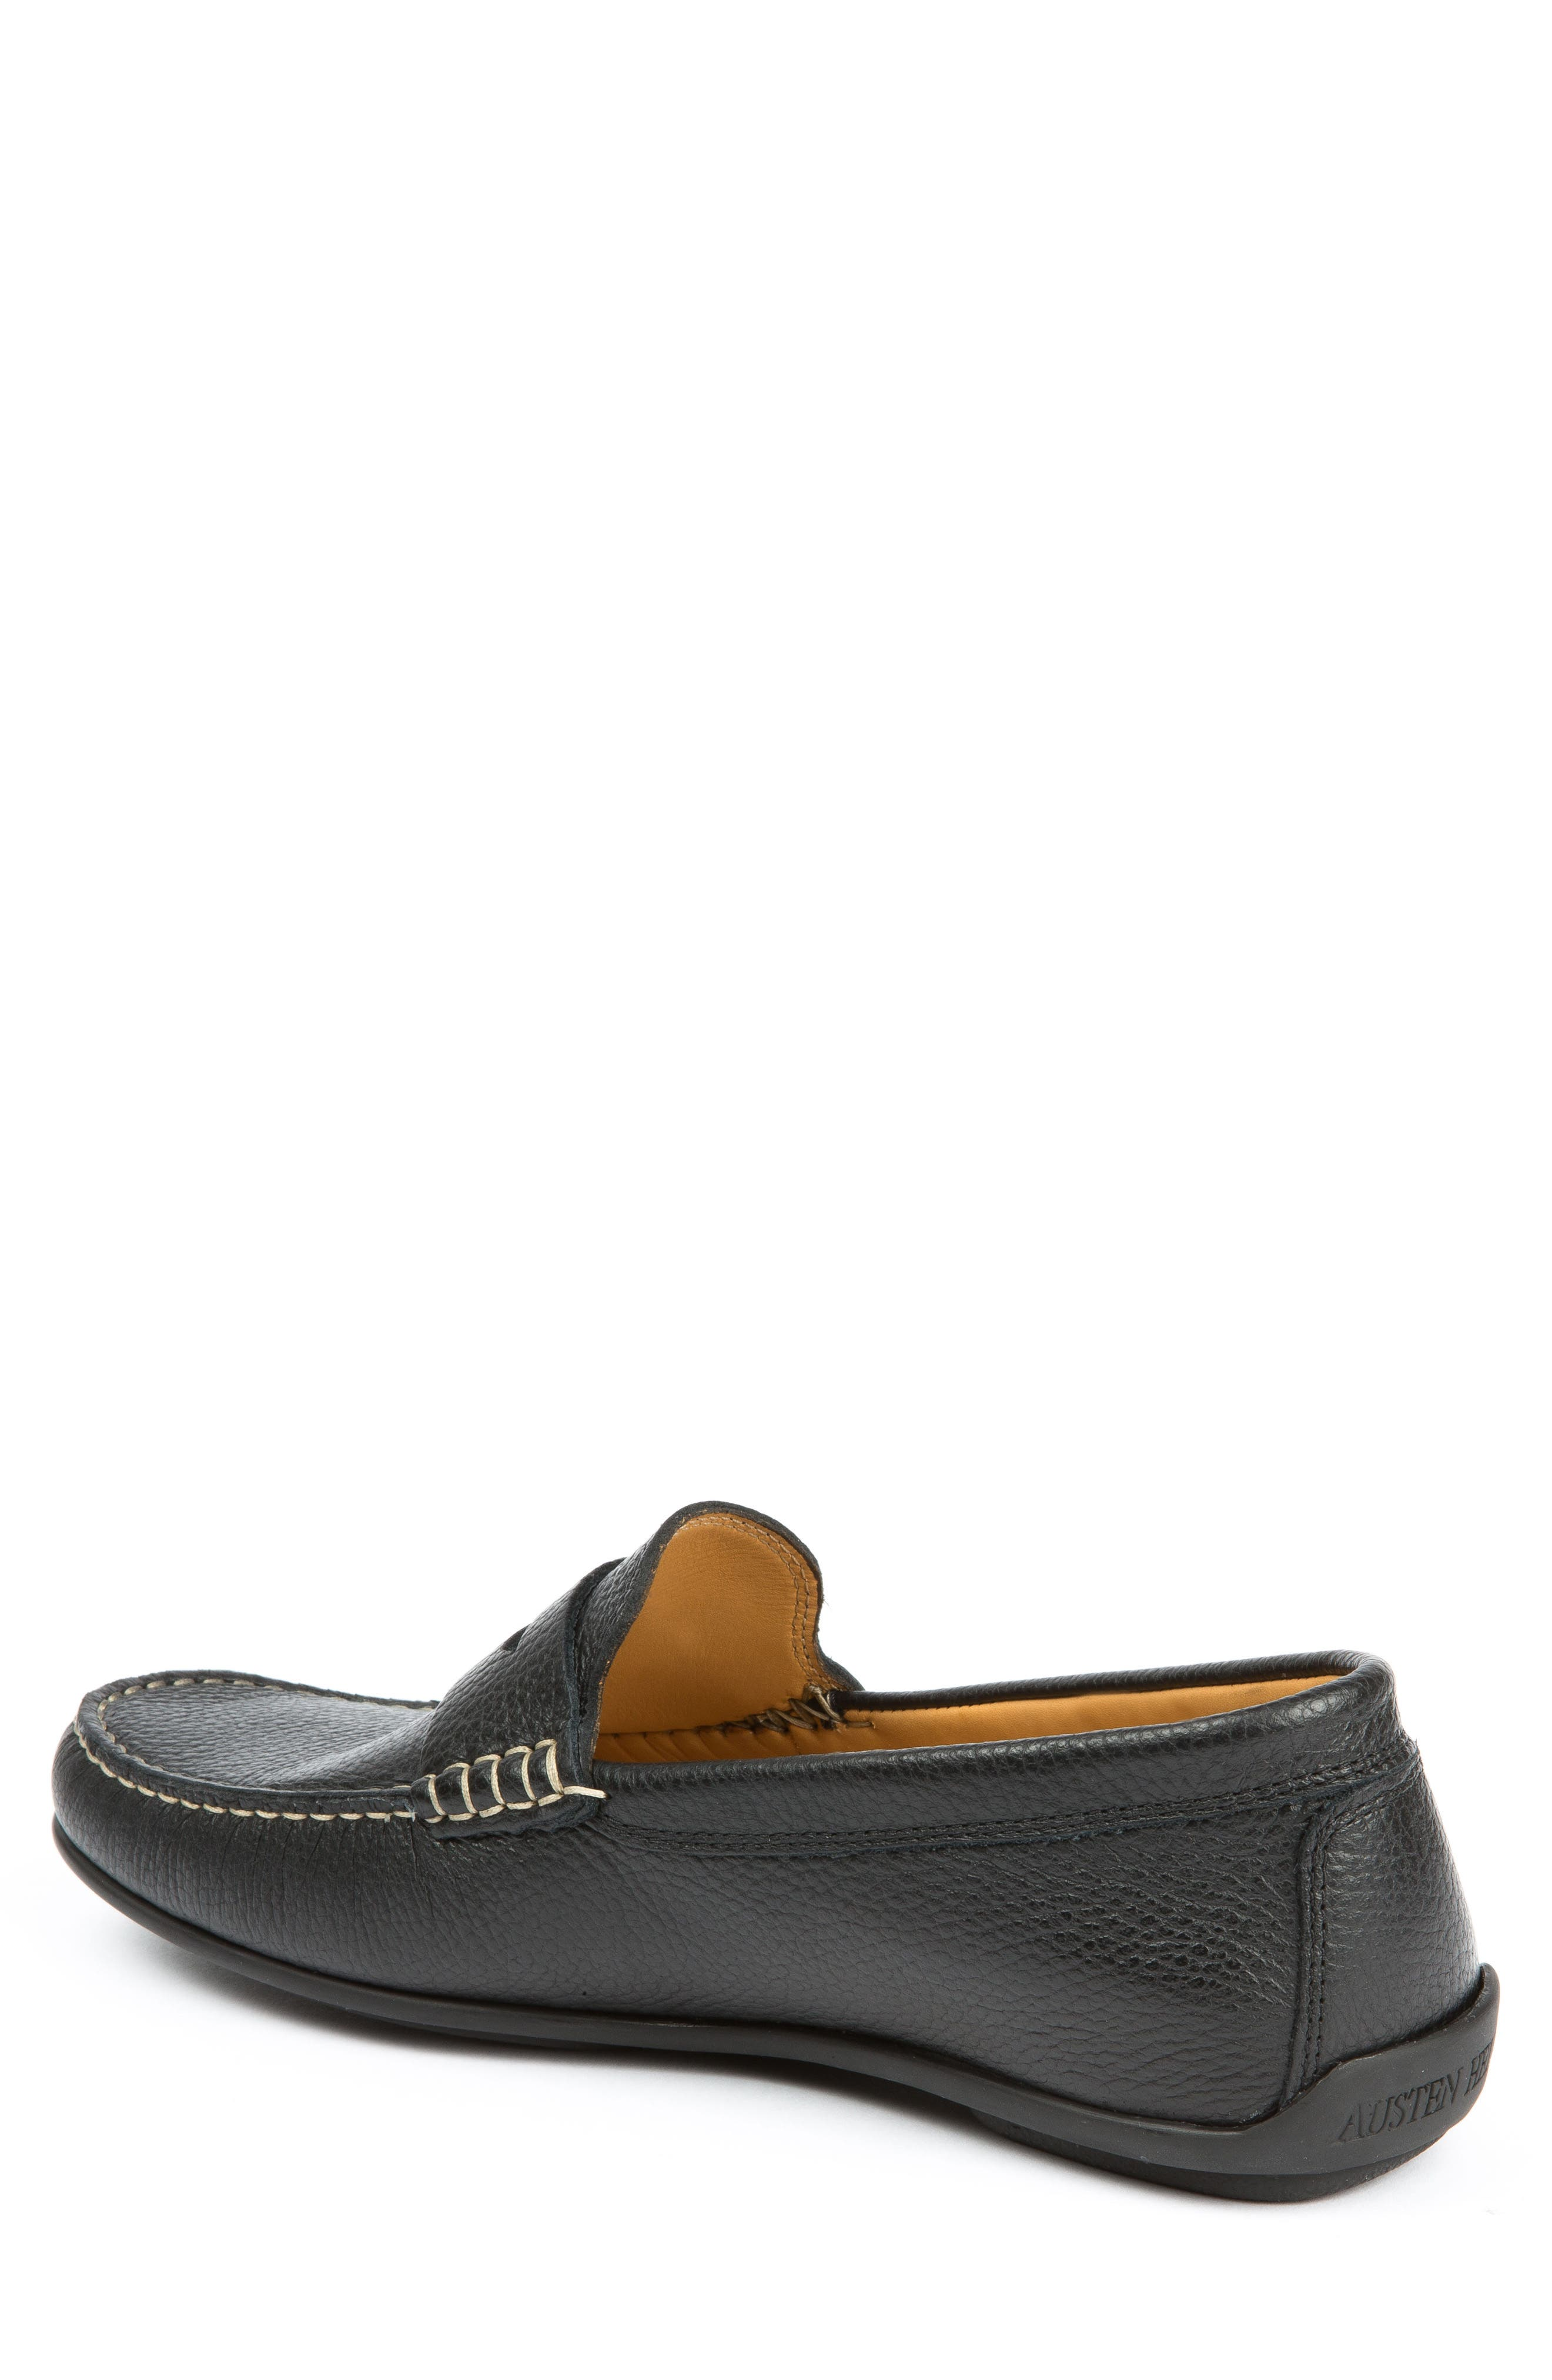 Hudsons Driving Shoe,                             Alternate thumbnail 2, color,                             BLACK GRAIN